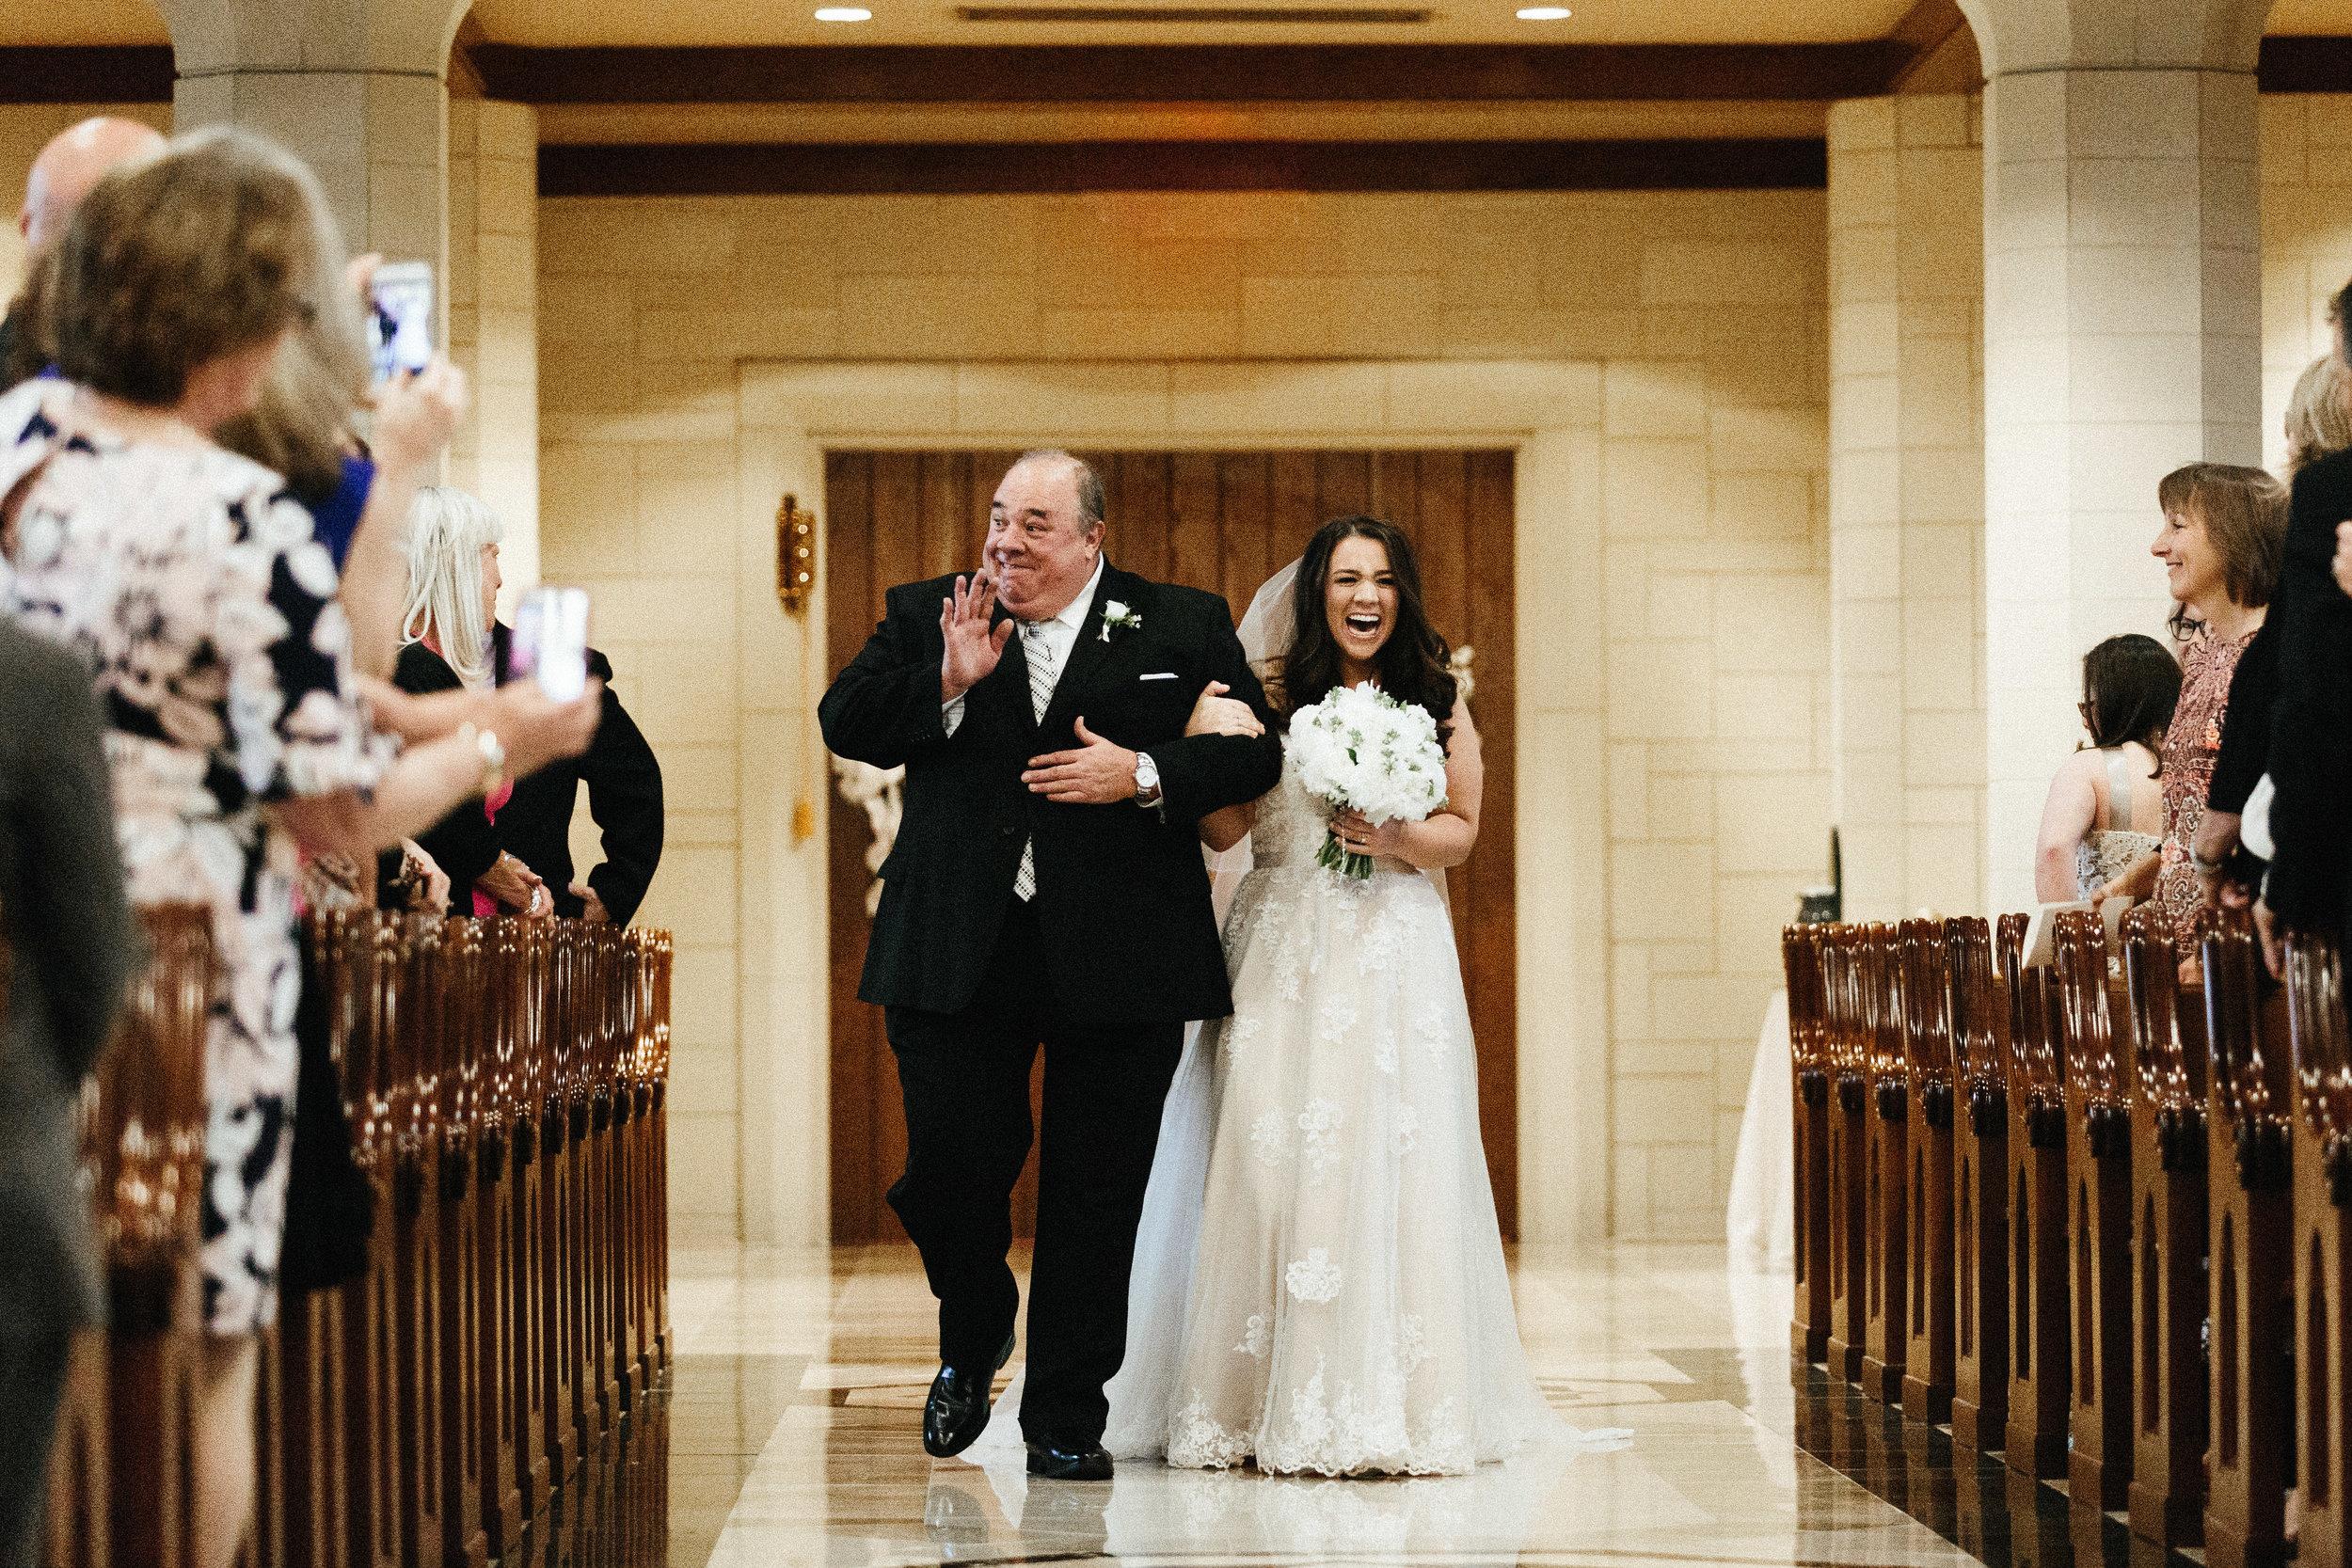 roswell_st_peter_chanel_catholic_avalon_hotel_alpharetta_wedding-1437.jpg